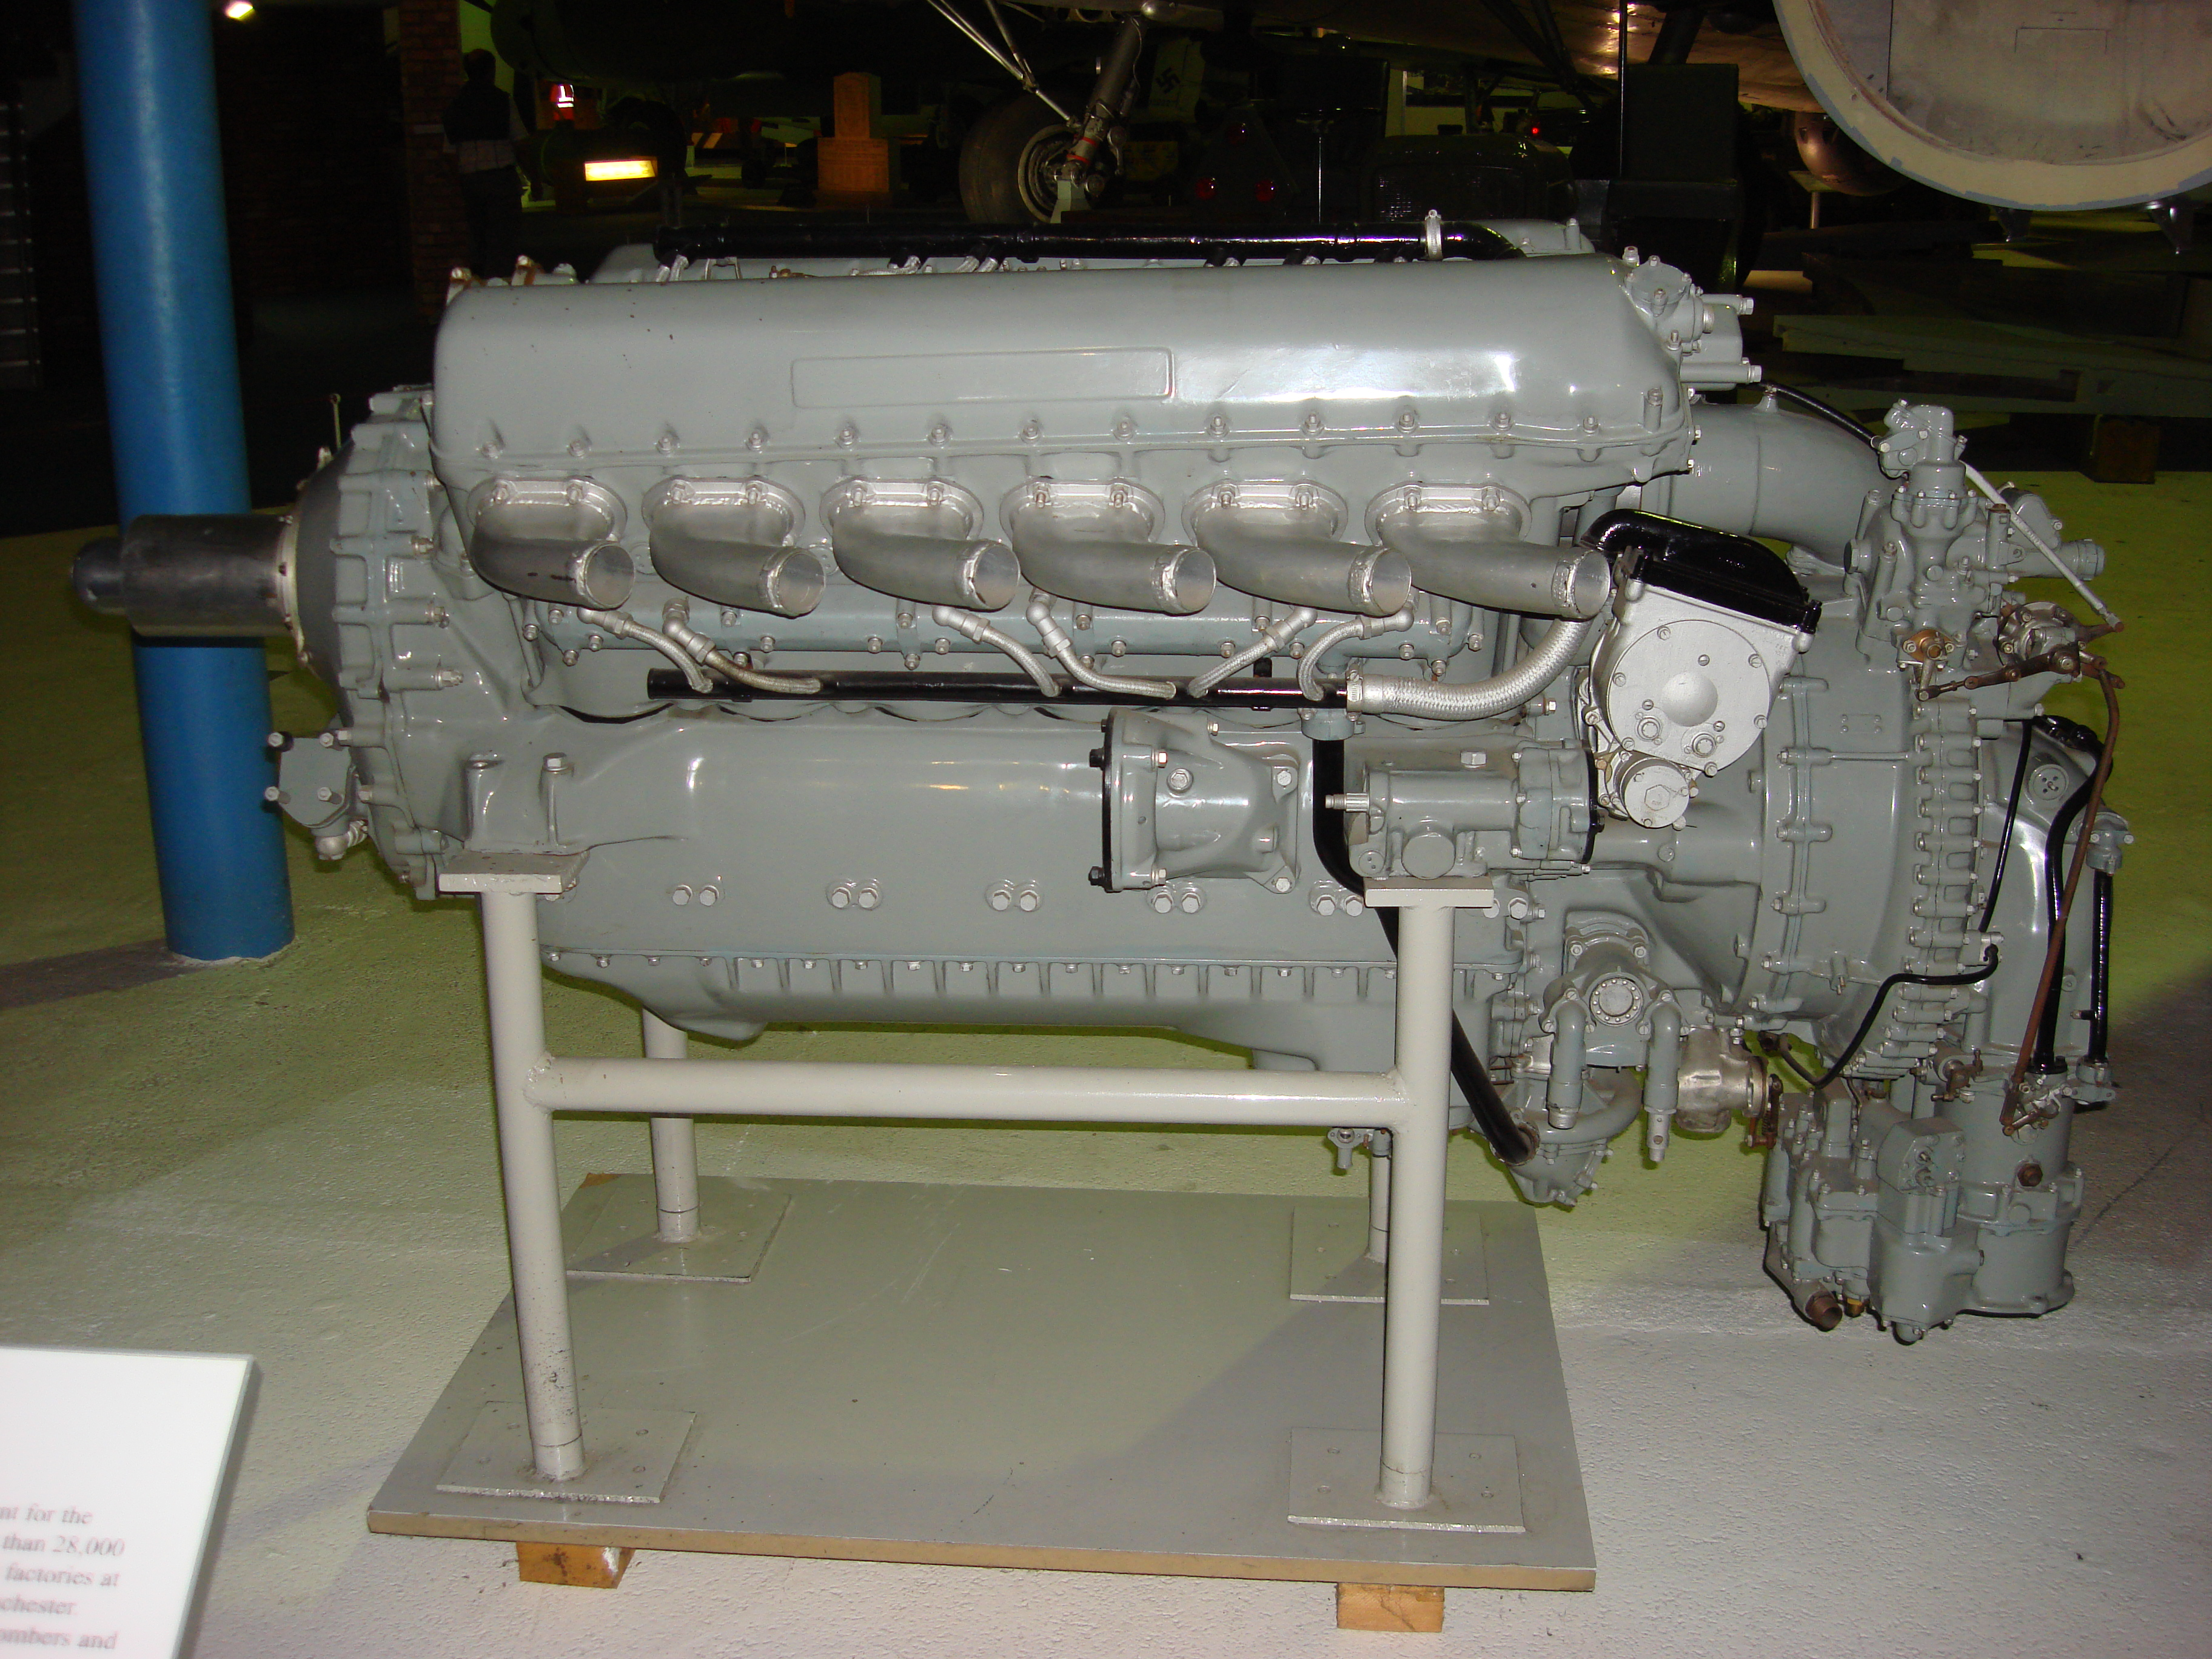 https://i1.wp.com/upload.wikimedia.org/wikipedia/commons/b/b0/Rolls_Royce_Merlin_XX.jpg